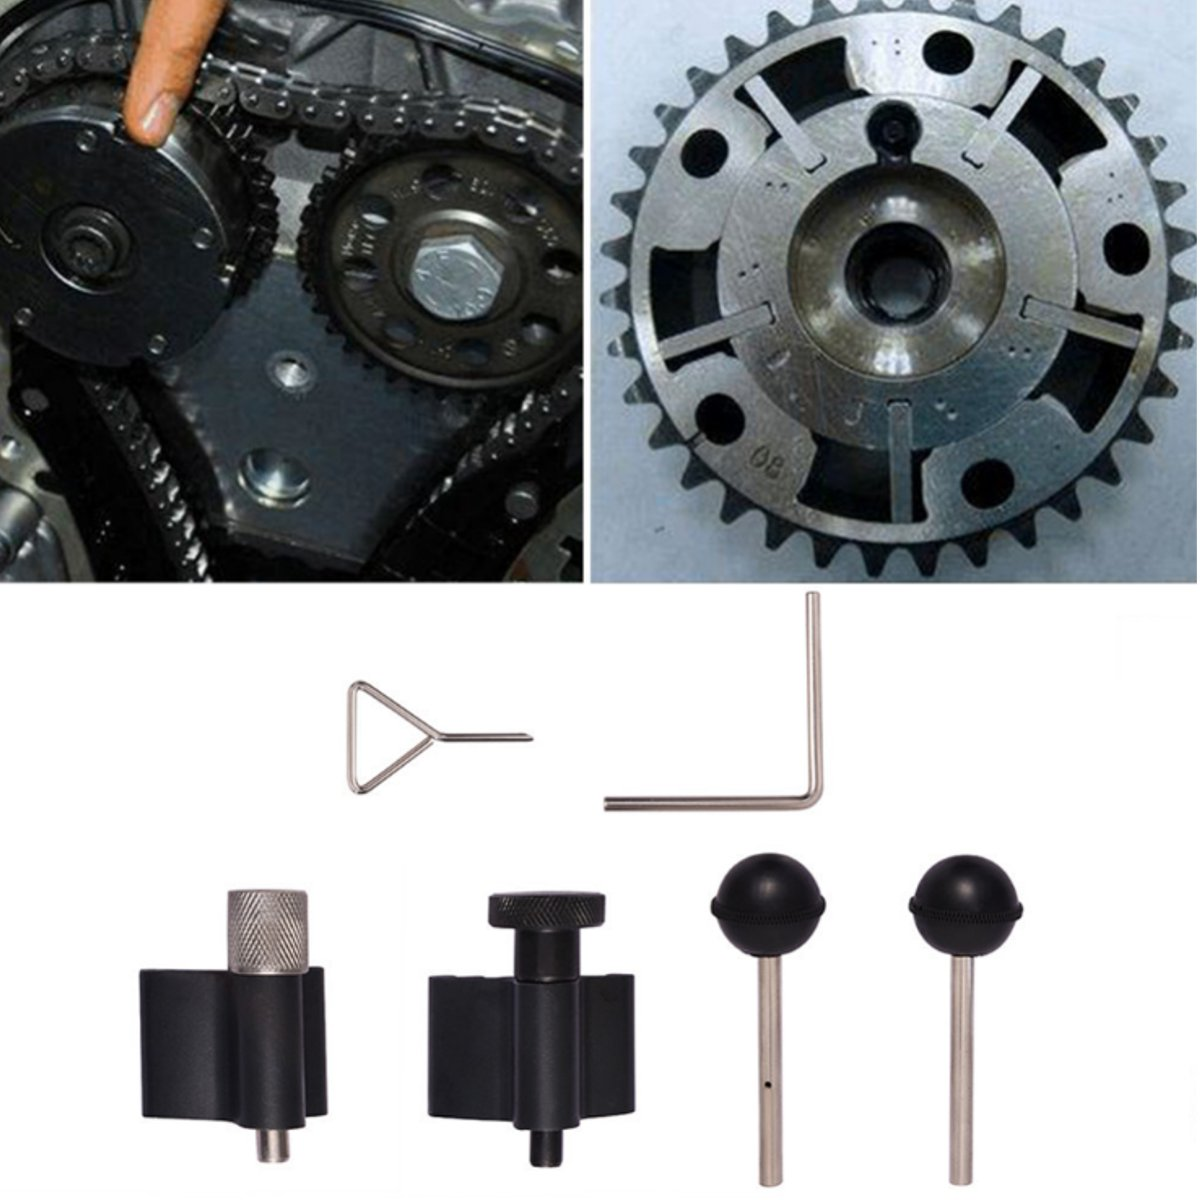 Audi A2 1.2 1.4 TDI PD VAG Diesel Engine Crank Crankshaft Timing Lock Tool Set